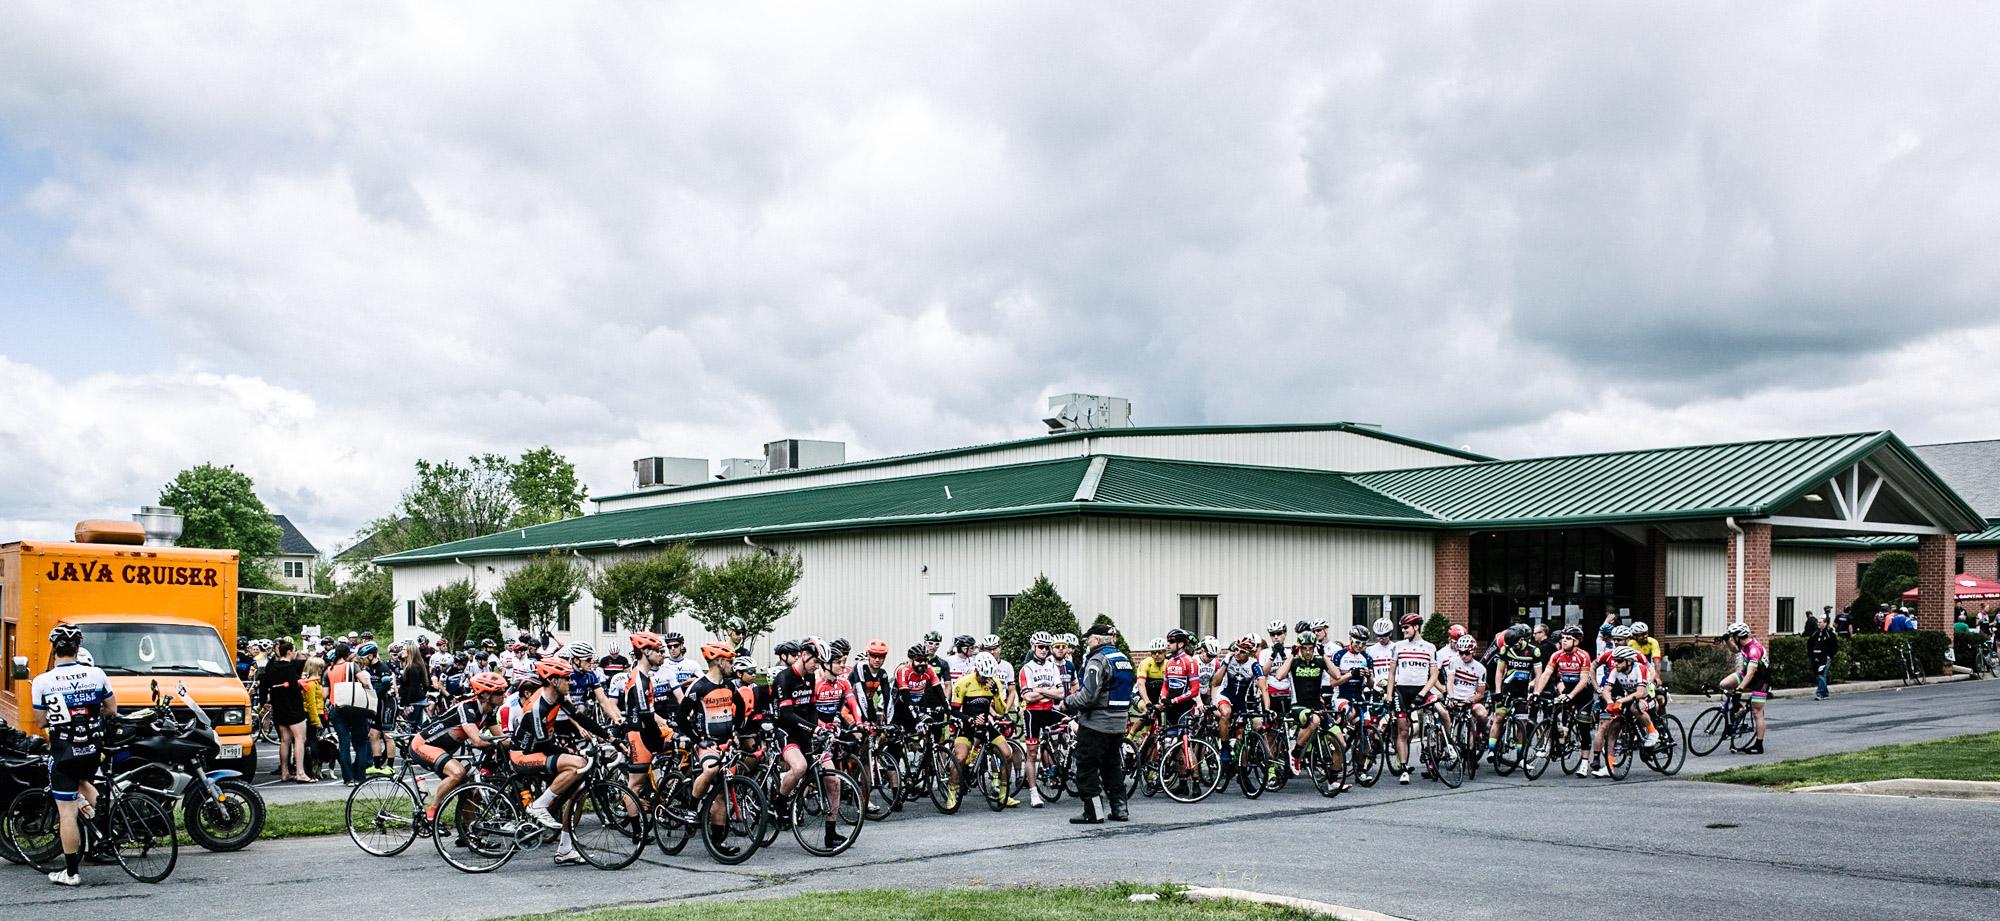 2016-05-07 - Poolesville Road Race-2001.jpg